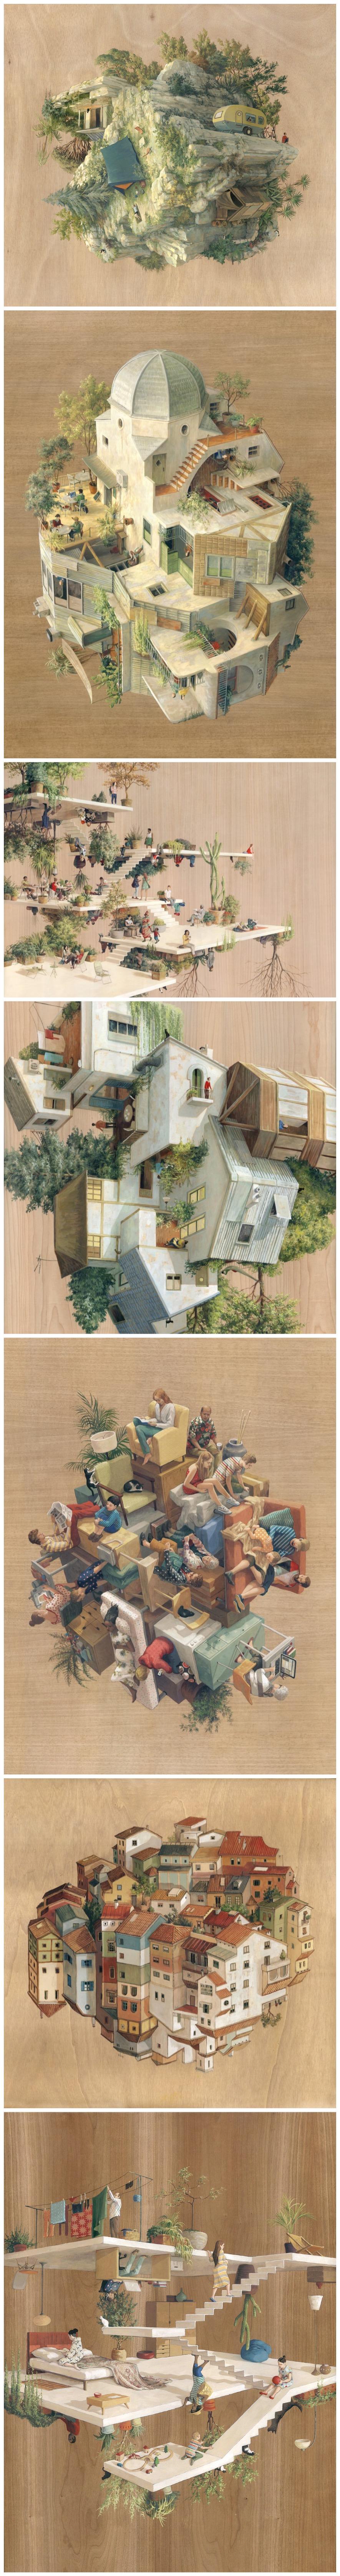 Etonnant Cinta Vidal Agulló   Inverted Architecture And Gravity Defying Worlds, Art,  Painting, Surrealism